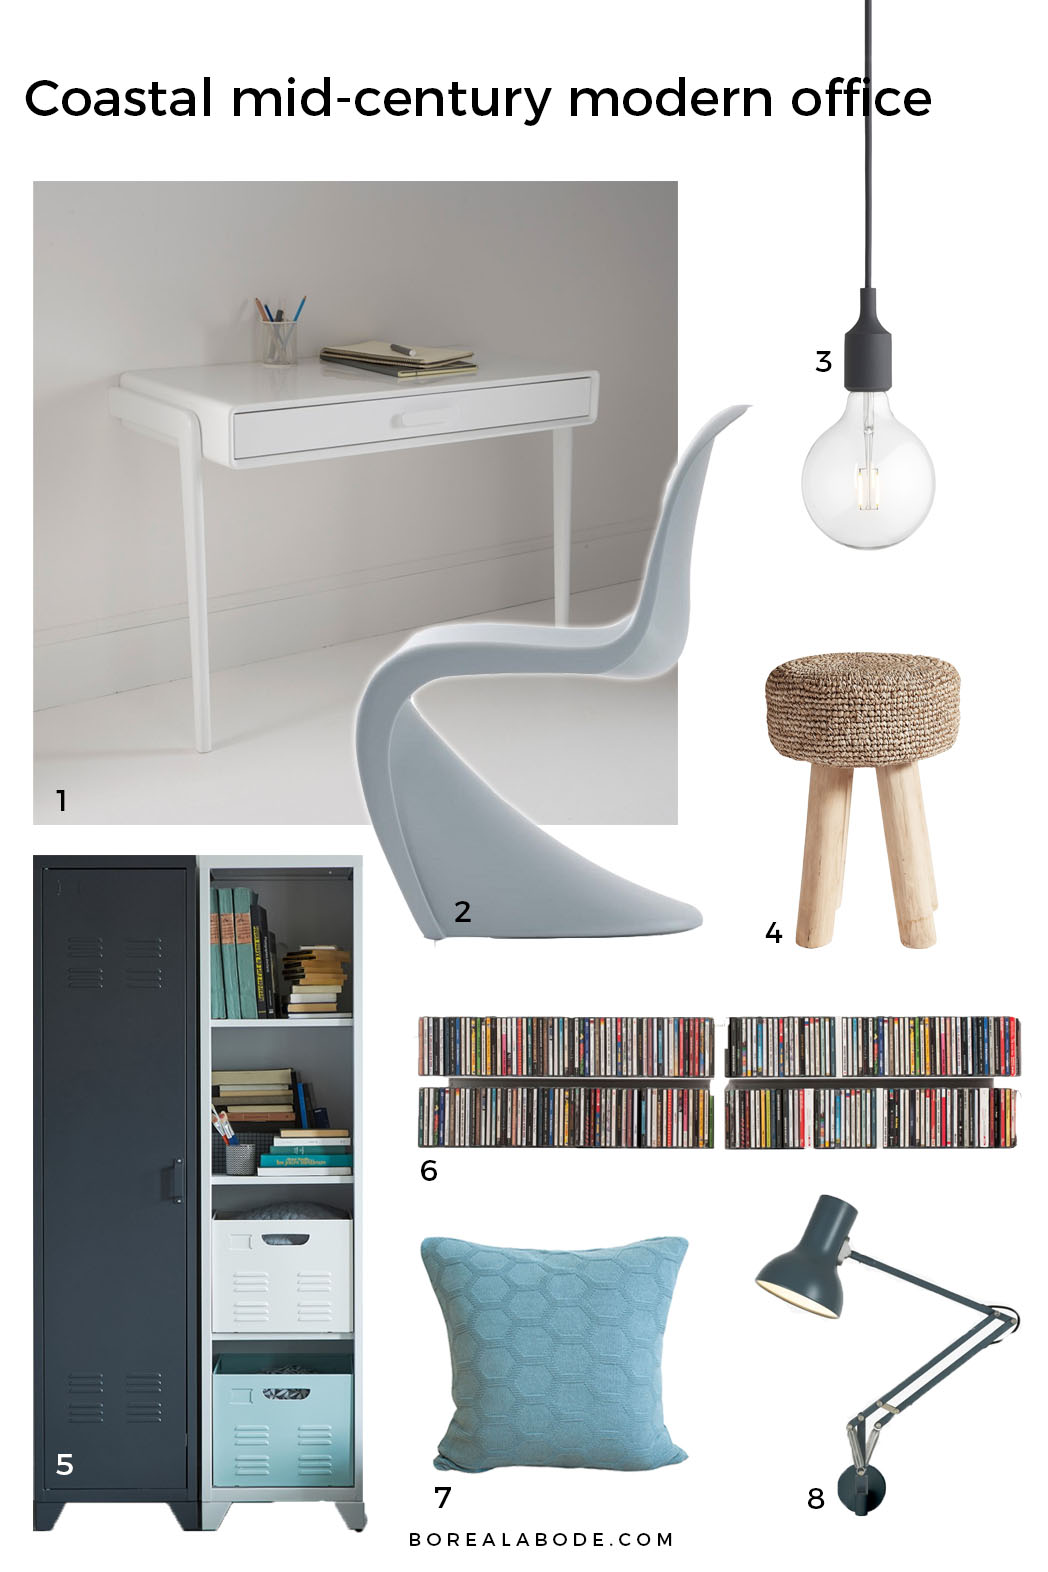 A coastal mid-century modern office mood board